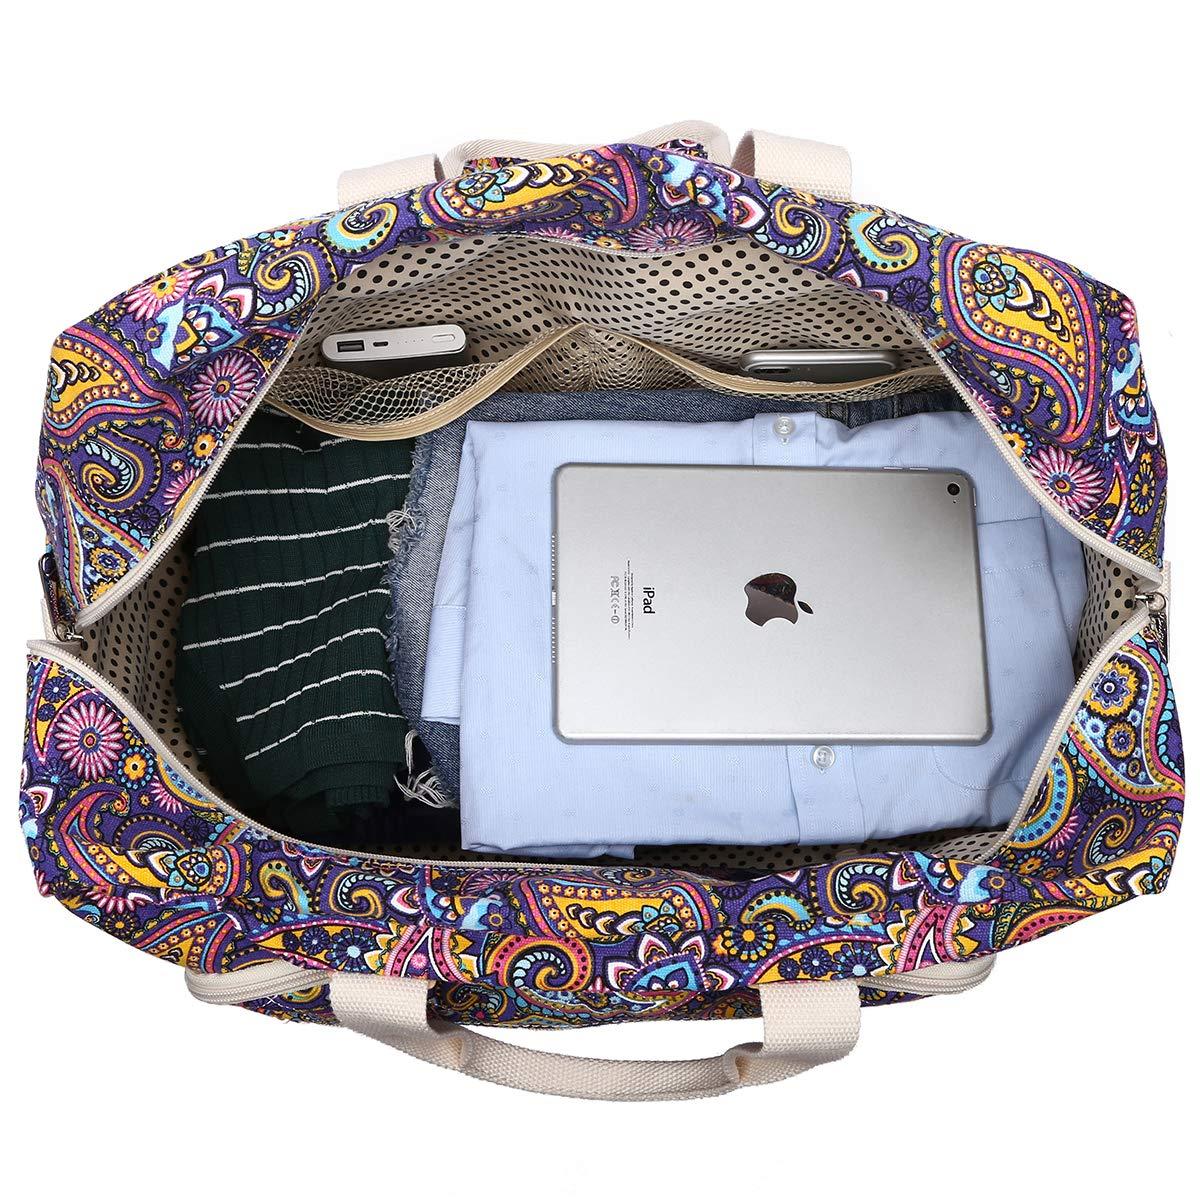 Malirona Women's Canvas Overnight Weekender Bag Carry On Travel Duffel Tote Bag Bohemian Flower (Purple Flower) by Malirona (Image #5)